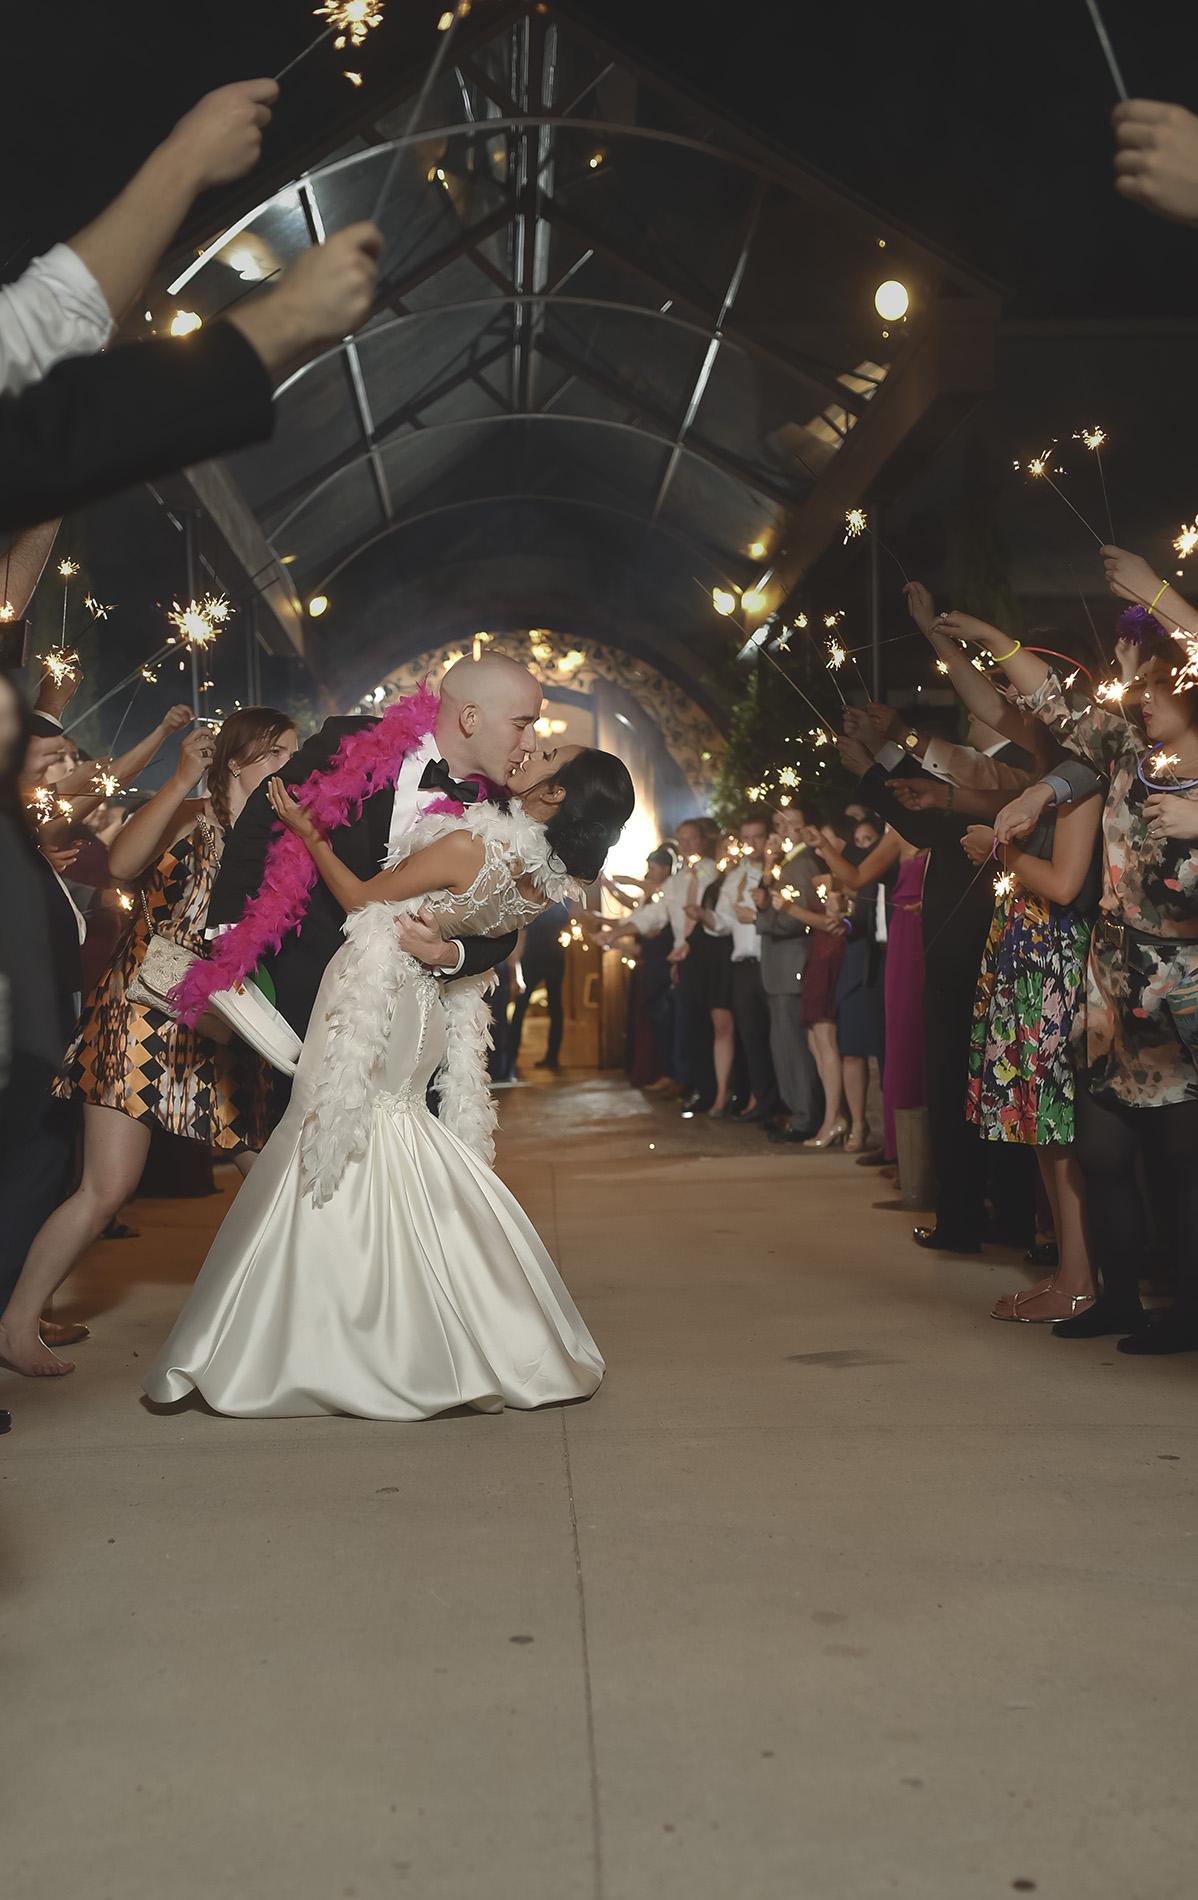 Houston-venue-Olde-Dobbin-Station-Romantic-Classic-Wedding-Photographer-125.jpg